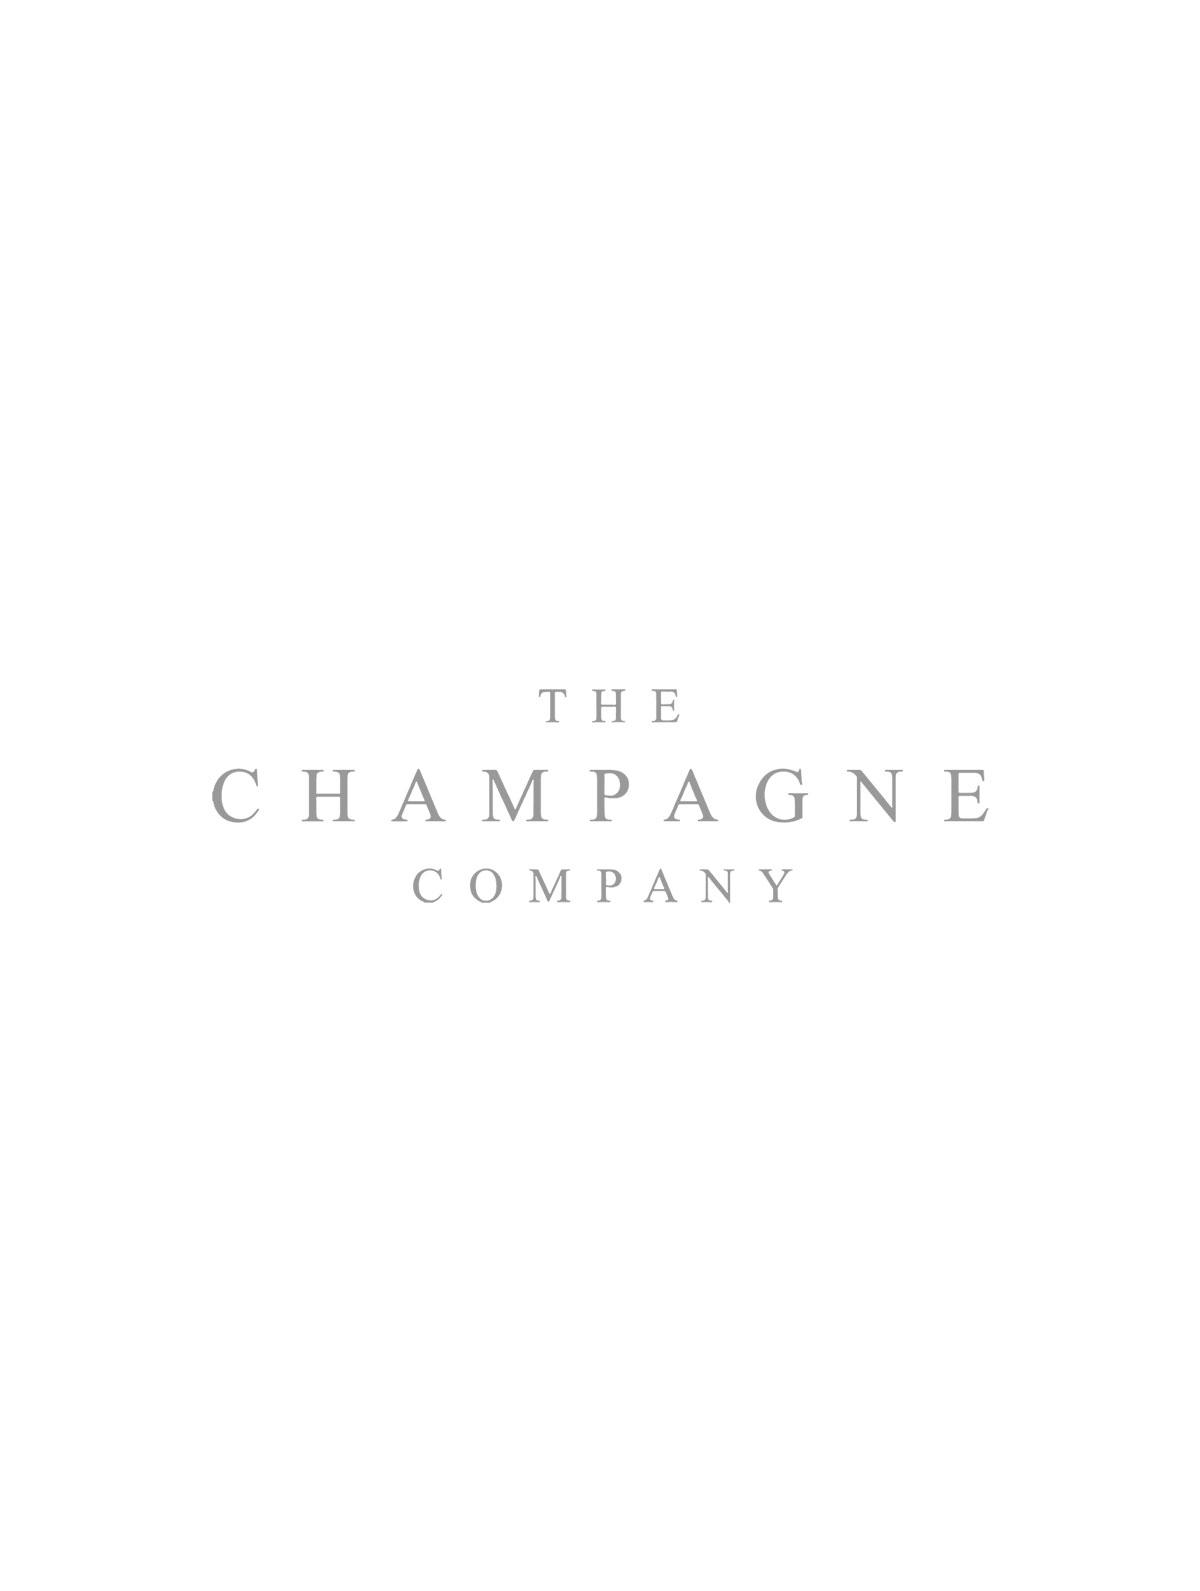 Glenmorangie Milsean Single Malt Scotch Whisky Private Edition 70cl